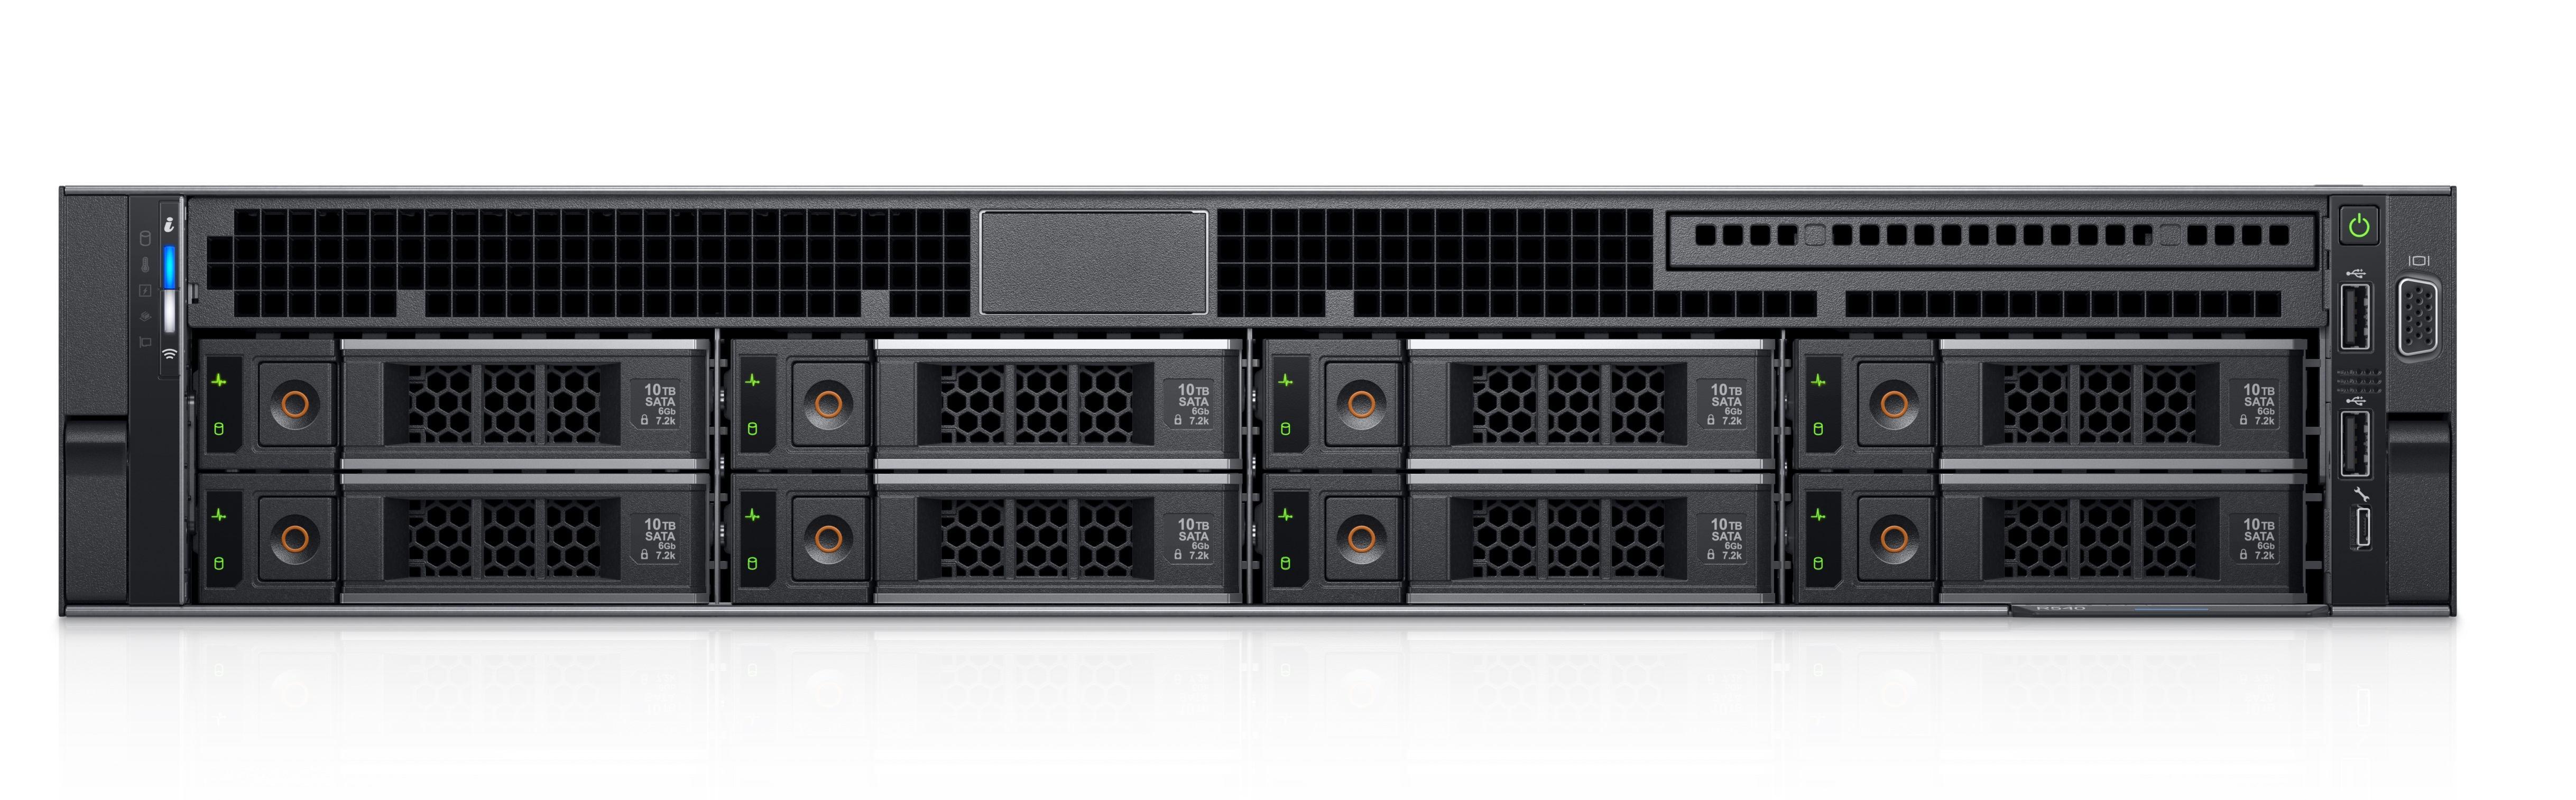 DELL PowerEdge R540 server 2 1 GHz Intel® Xeon® 4110 Rack